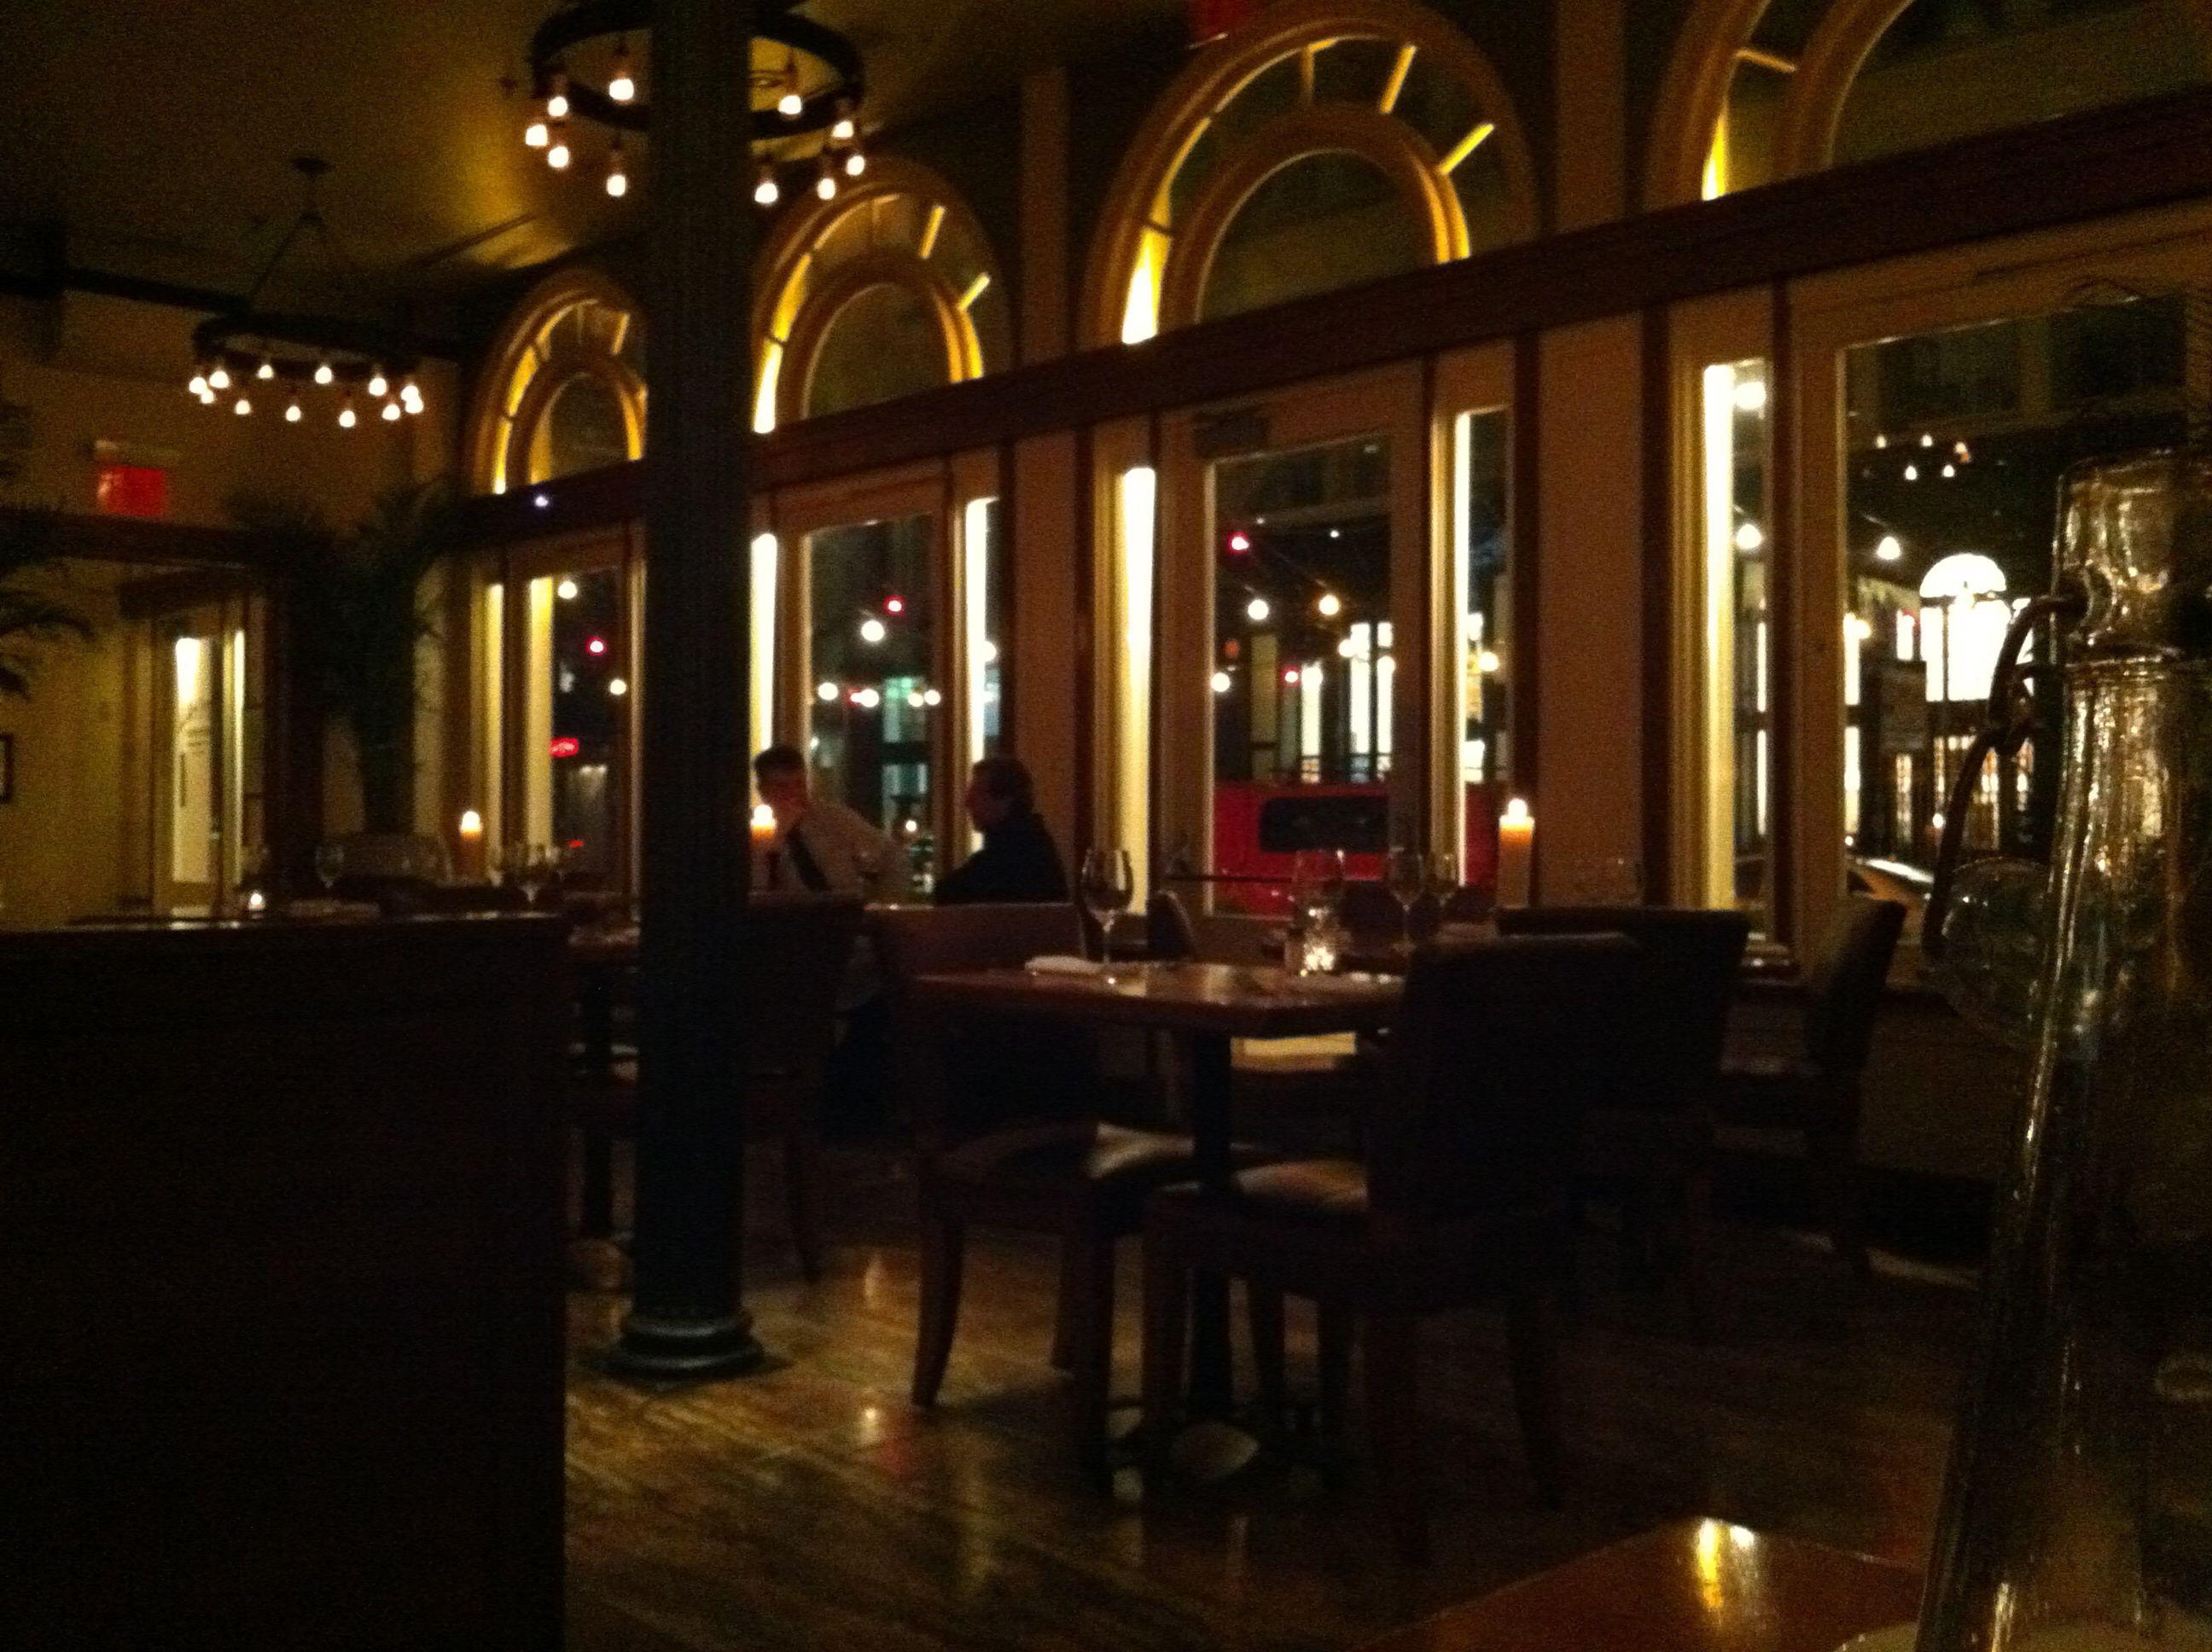 City hall restaurant tribeca nyc tribeca nyc home